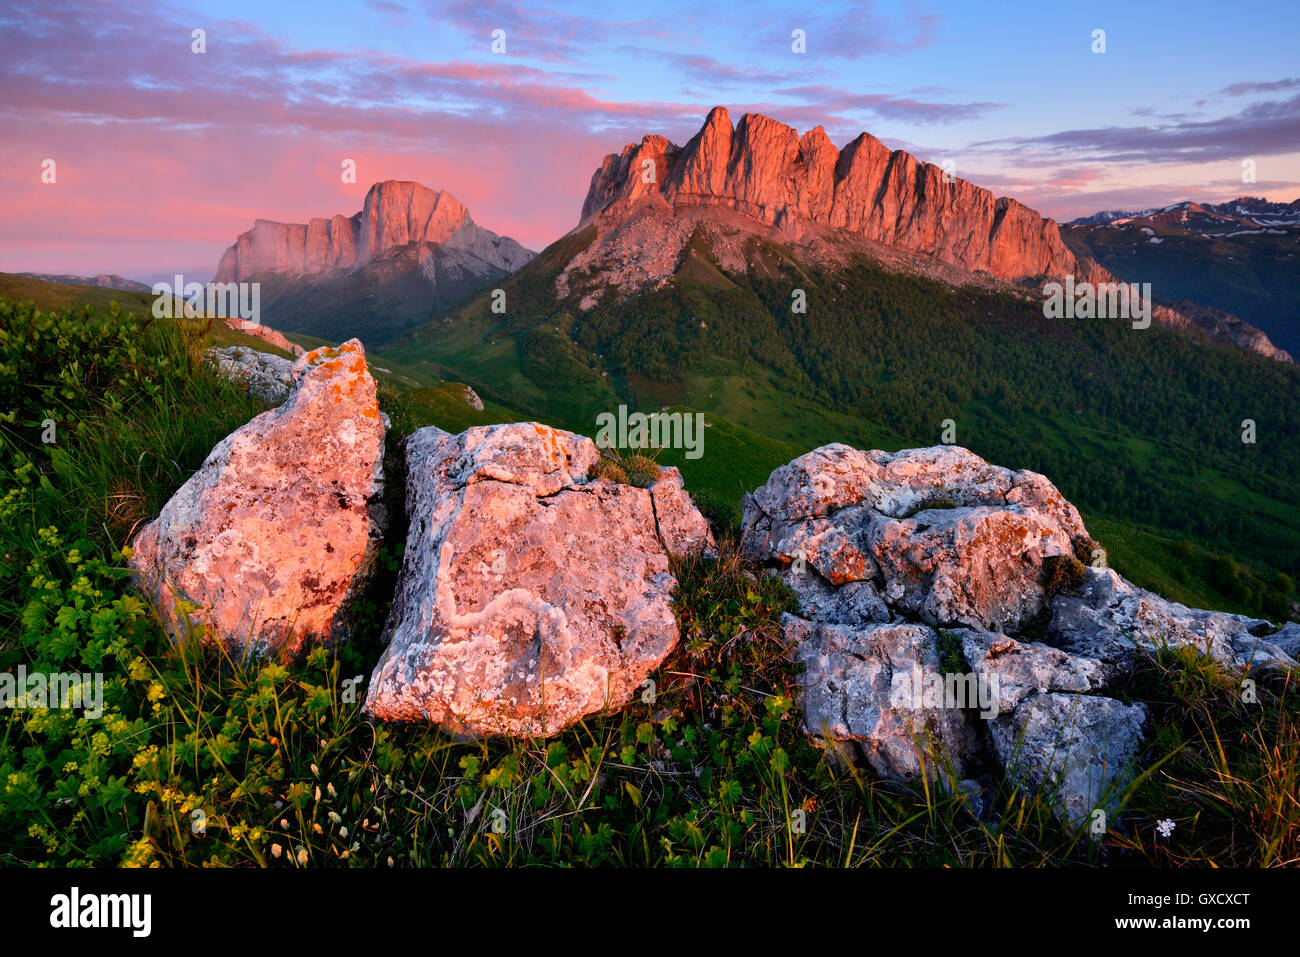 Dusk over Acheshboki mountains in background, Bolshoy Thach Nature Park, Caucasian Mountains, Republic of Adygea, - Stock Image